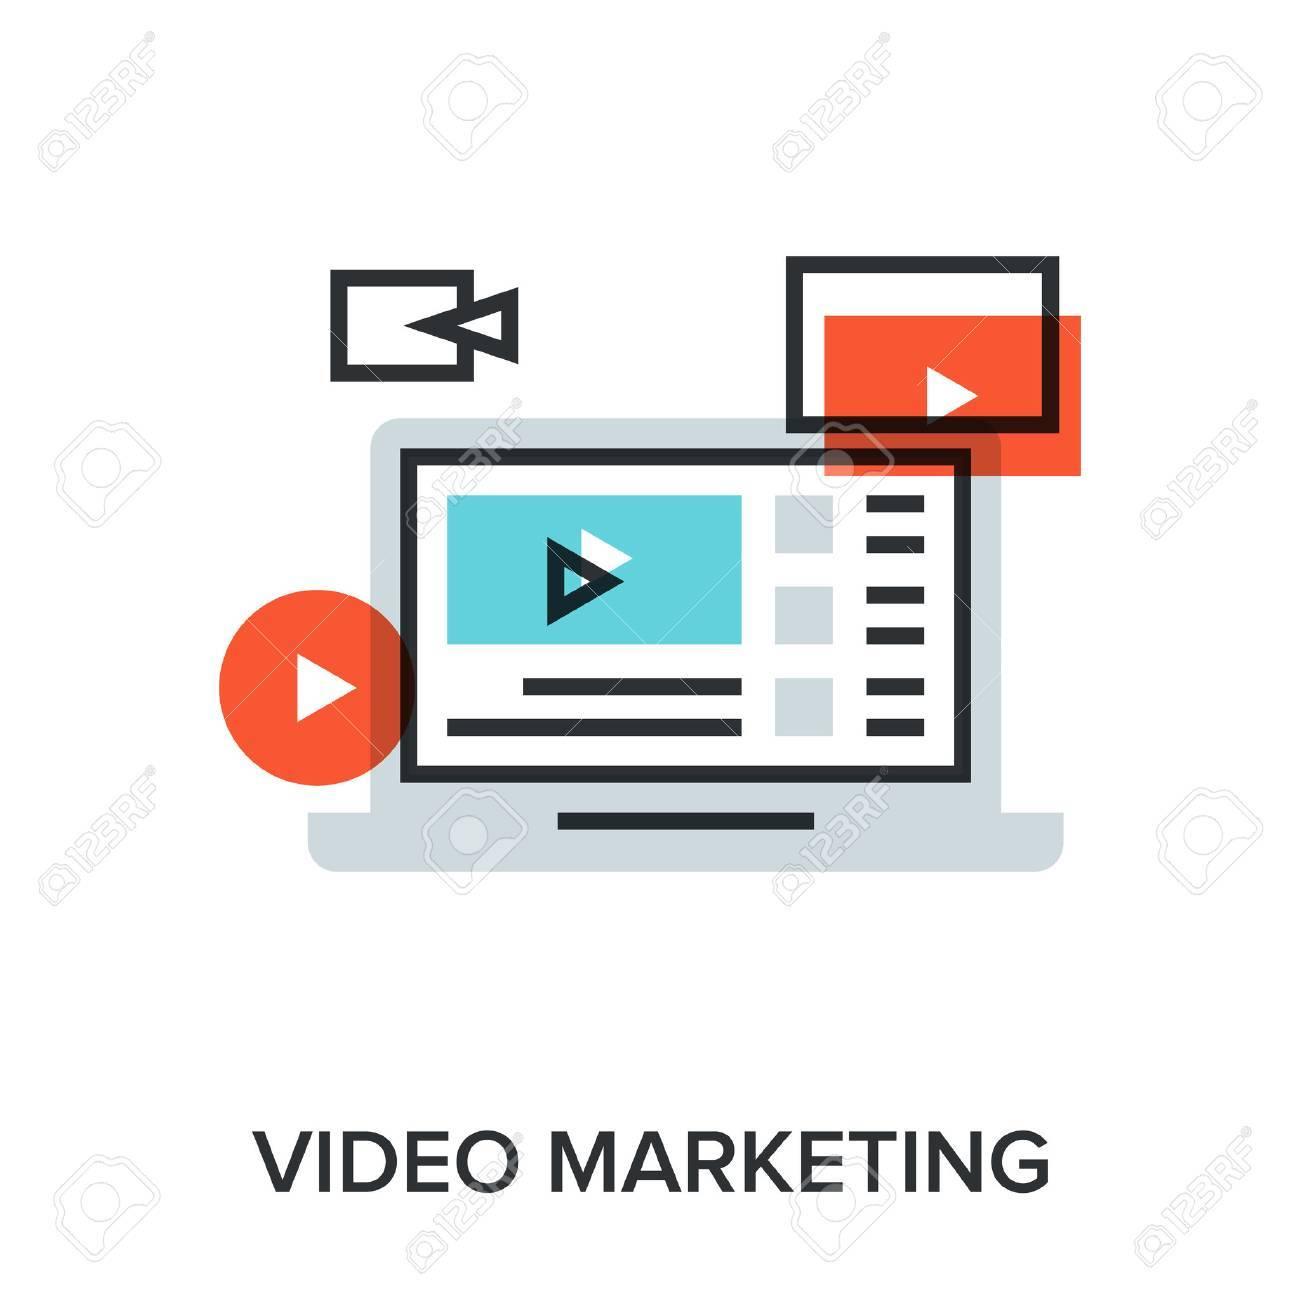 Vector illustration of video marketing flat line design concept. - 46347177